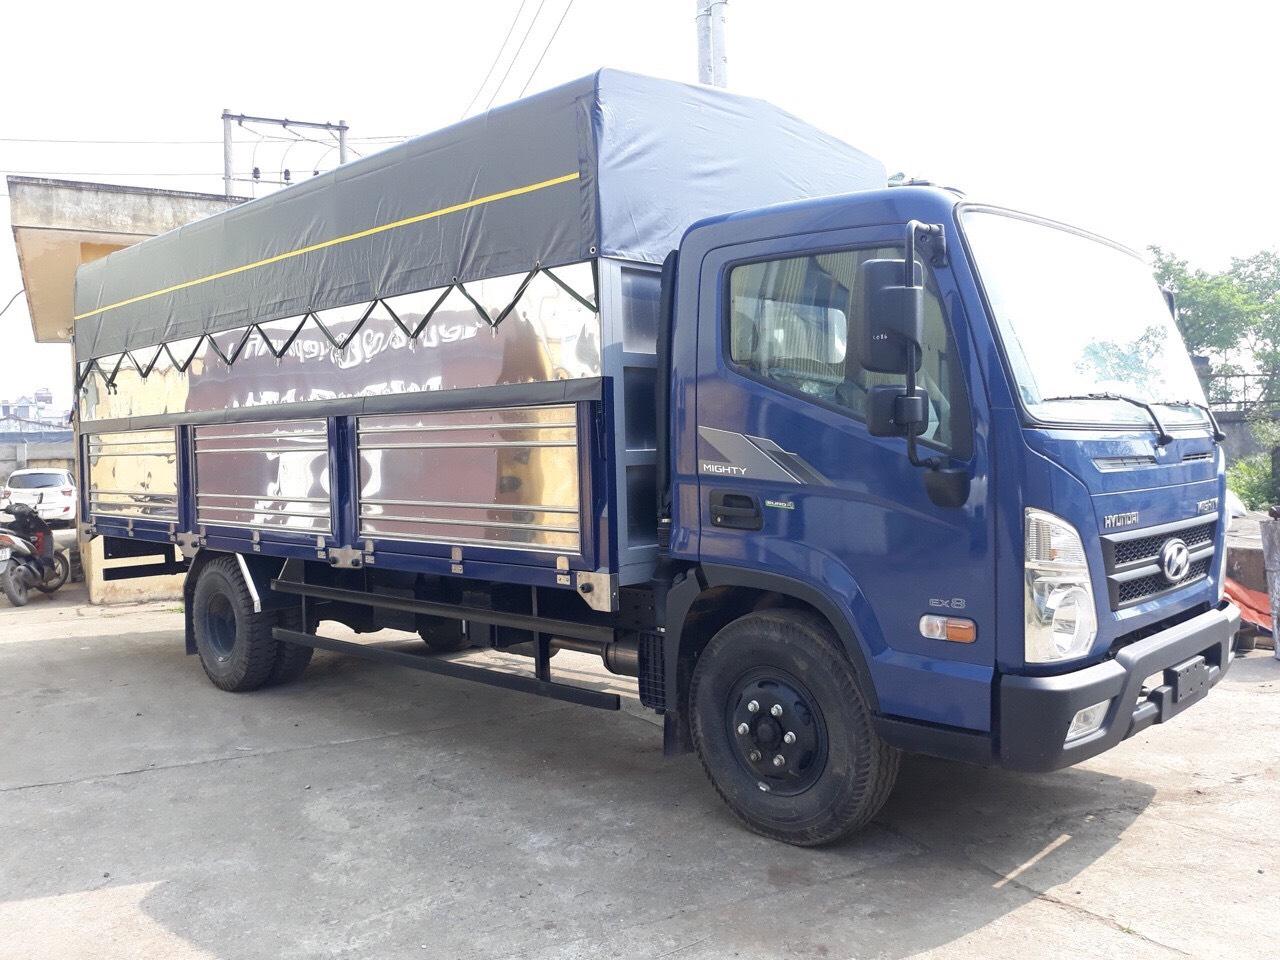 Bán xe tải Hyundai EX8 tại Phú Thọ